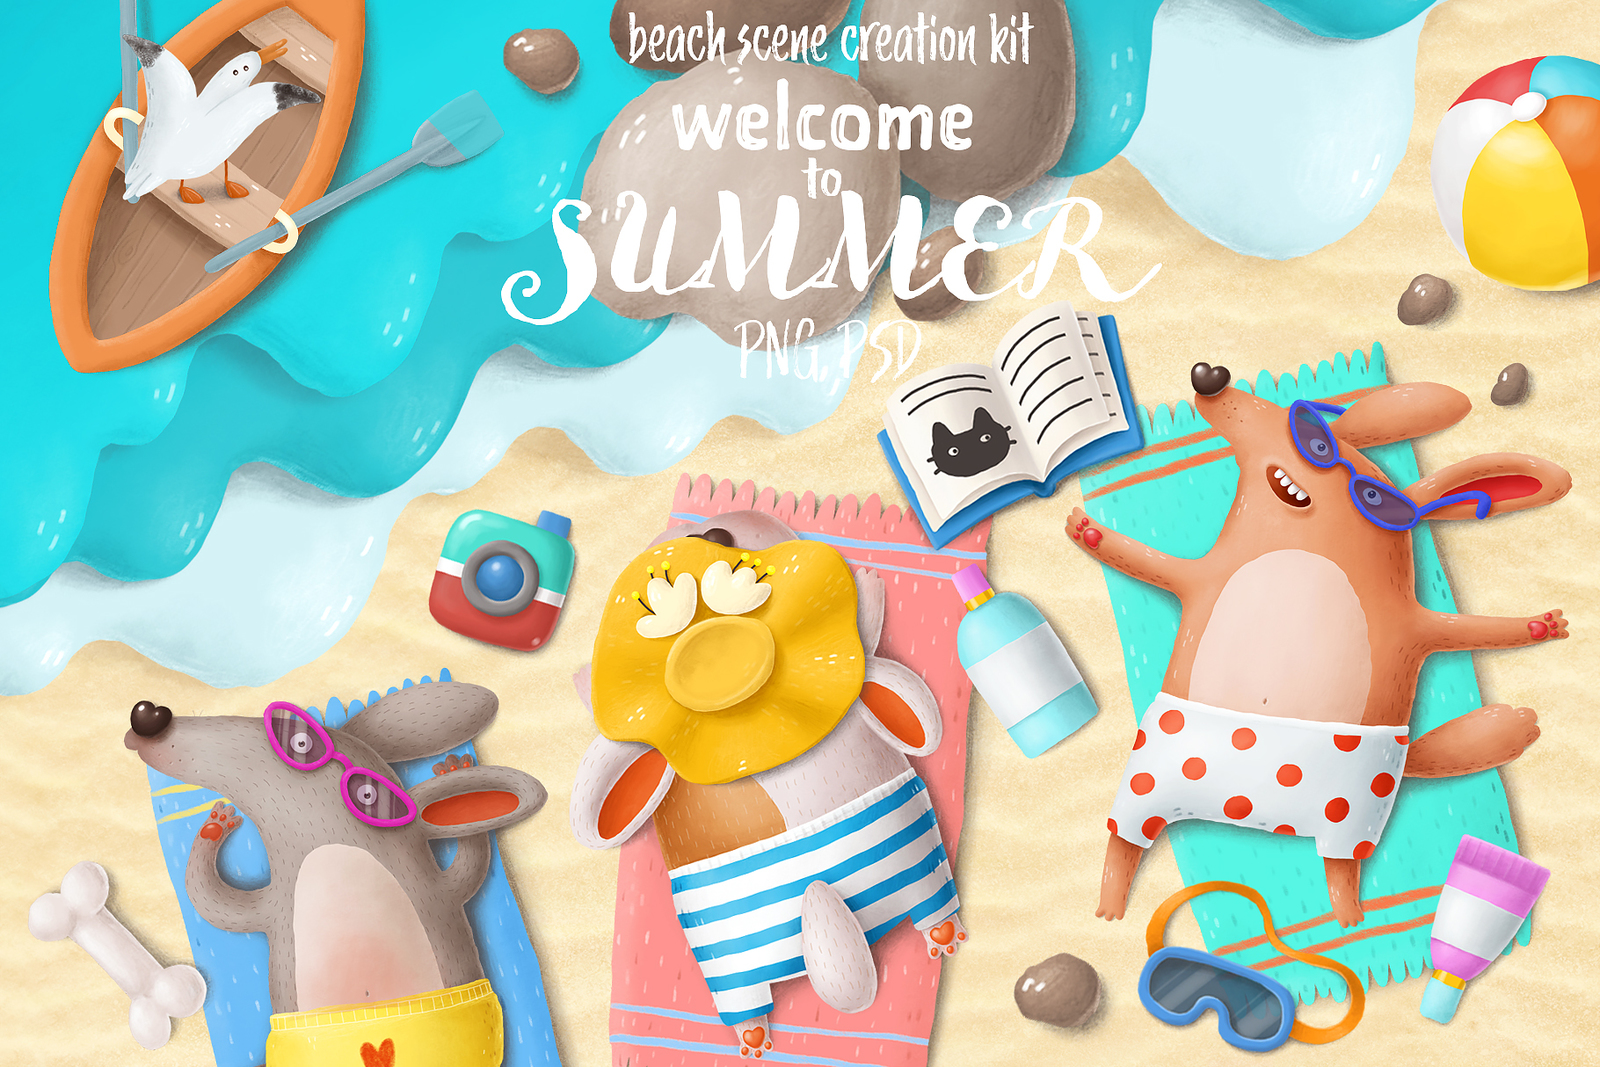 Beach scene creation kit